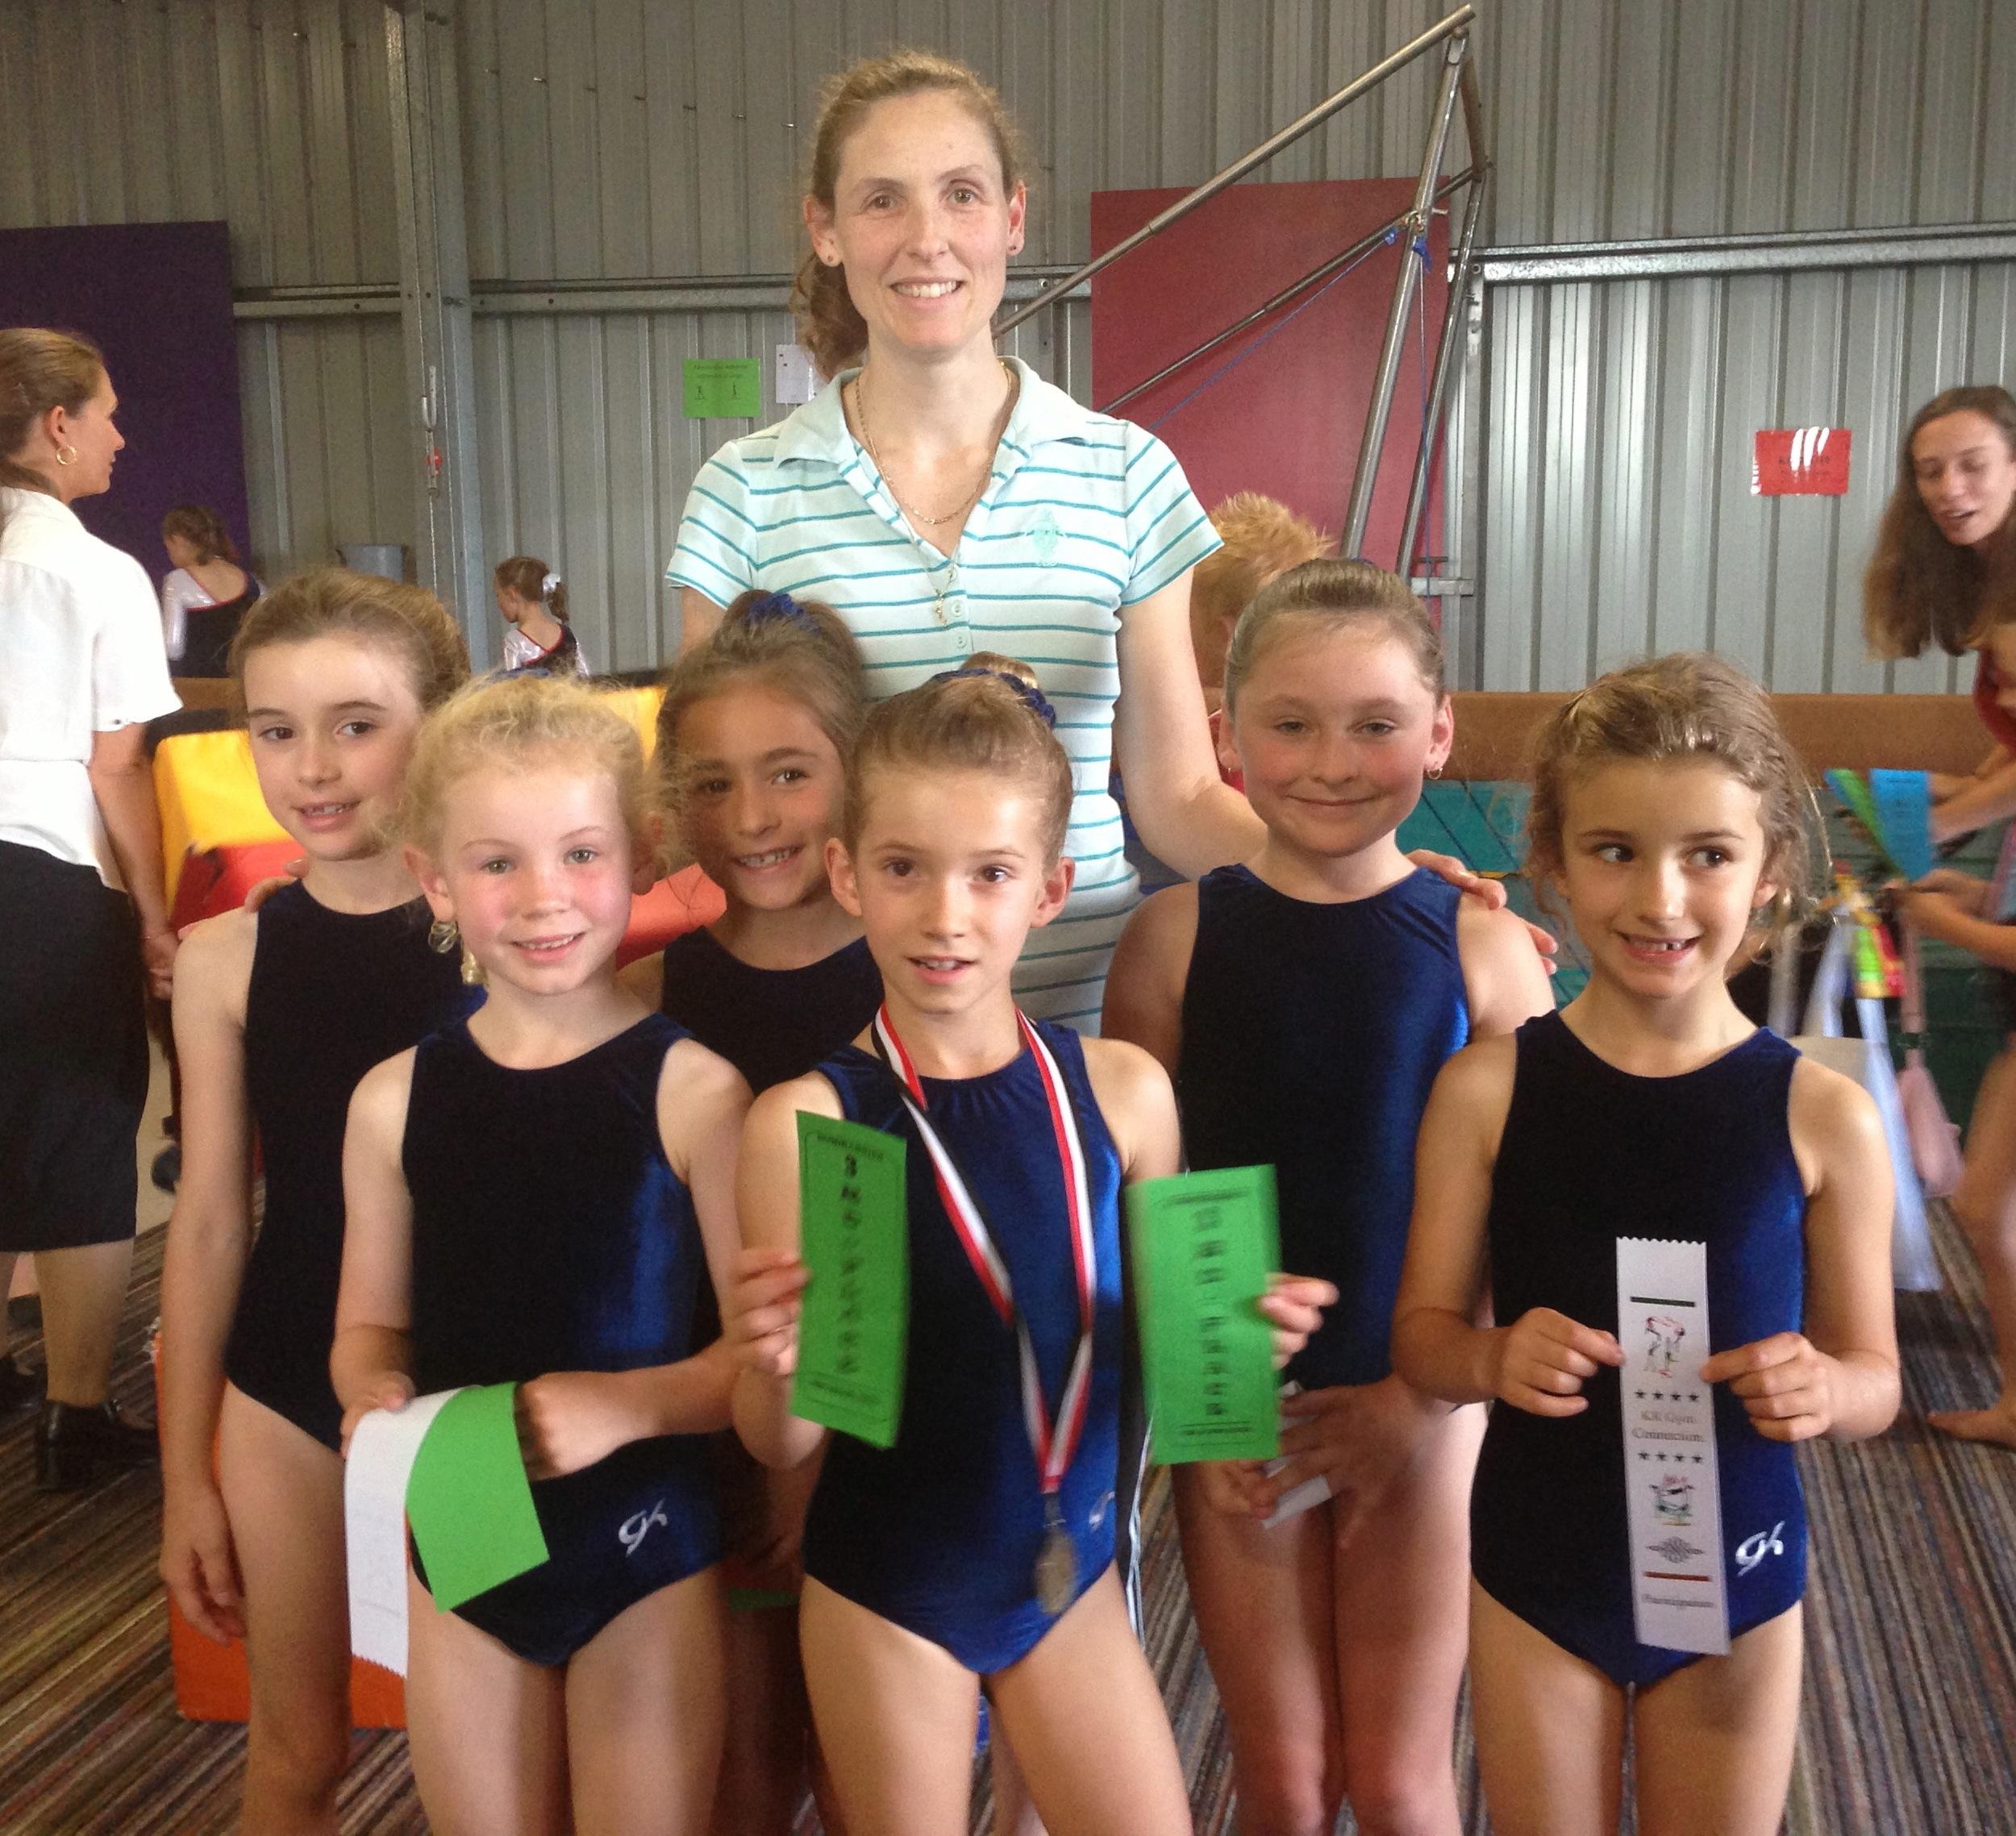 Our Intermediate Level 1 team: Tandia, Mackenzie, Chloe  Our Junior Level 1 team: Harriet, Mia, Bridget